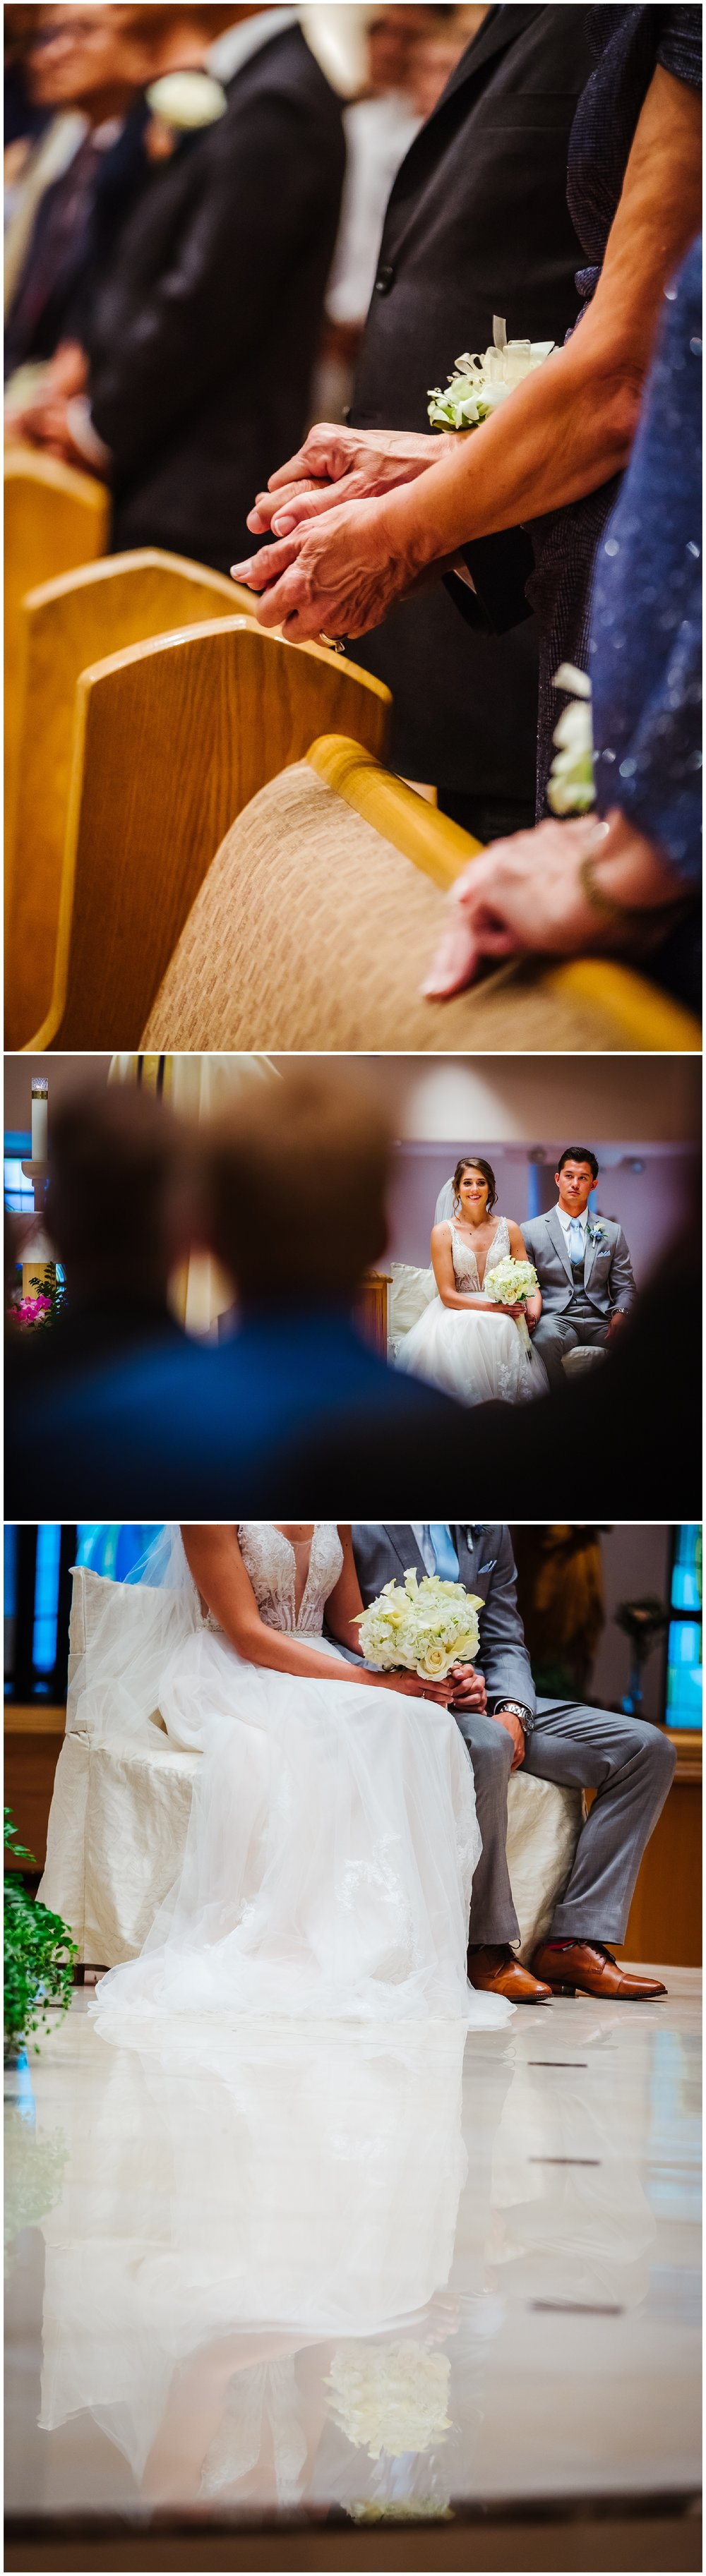 mahaffey-theater-big-military-wedding-st-pete-photographer-blue_0031.jpg